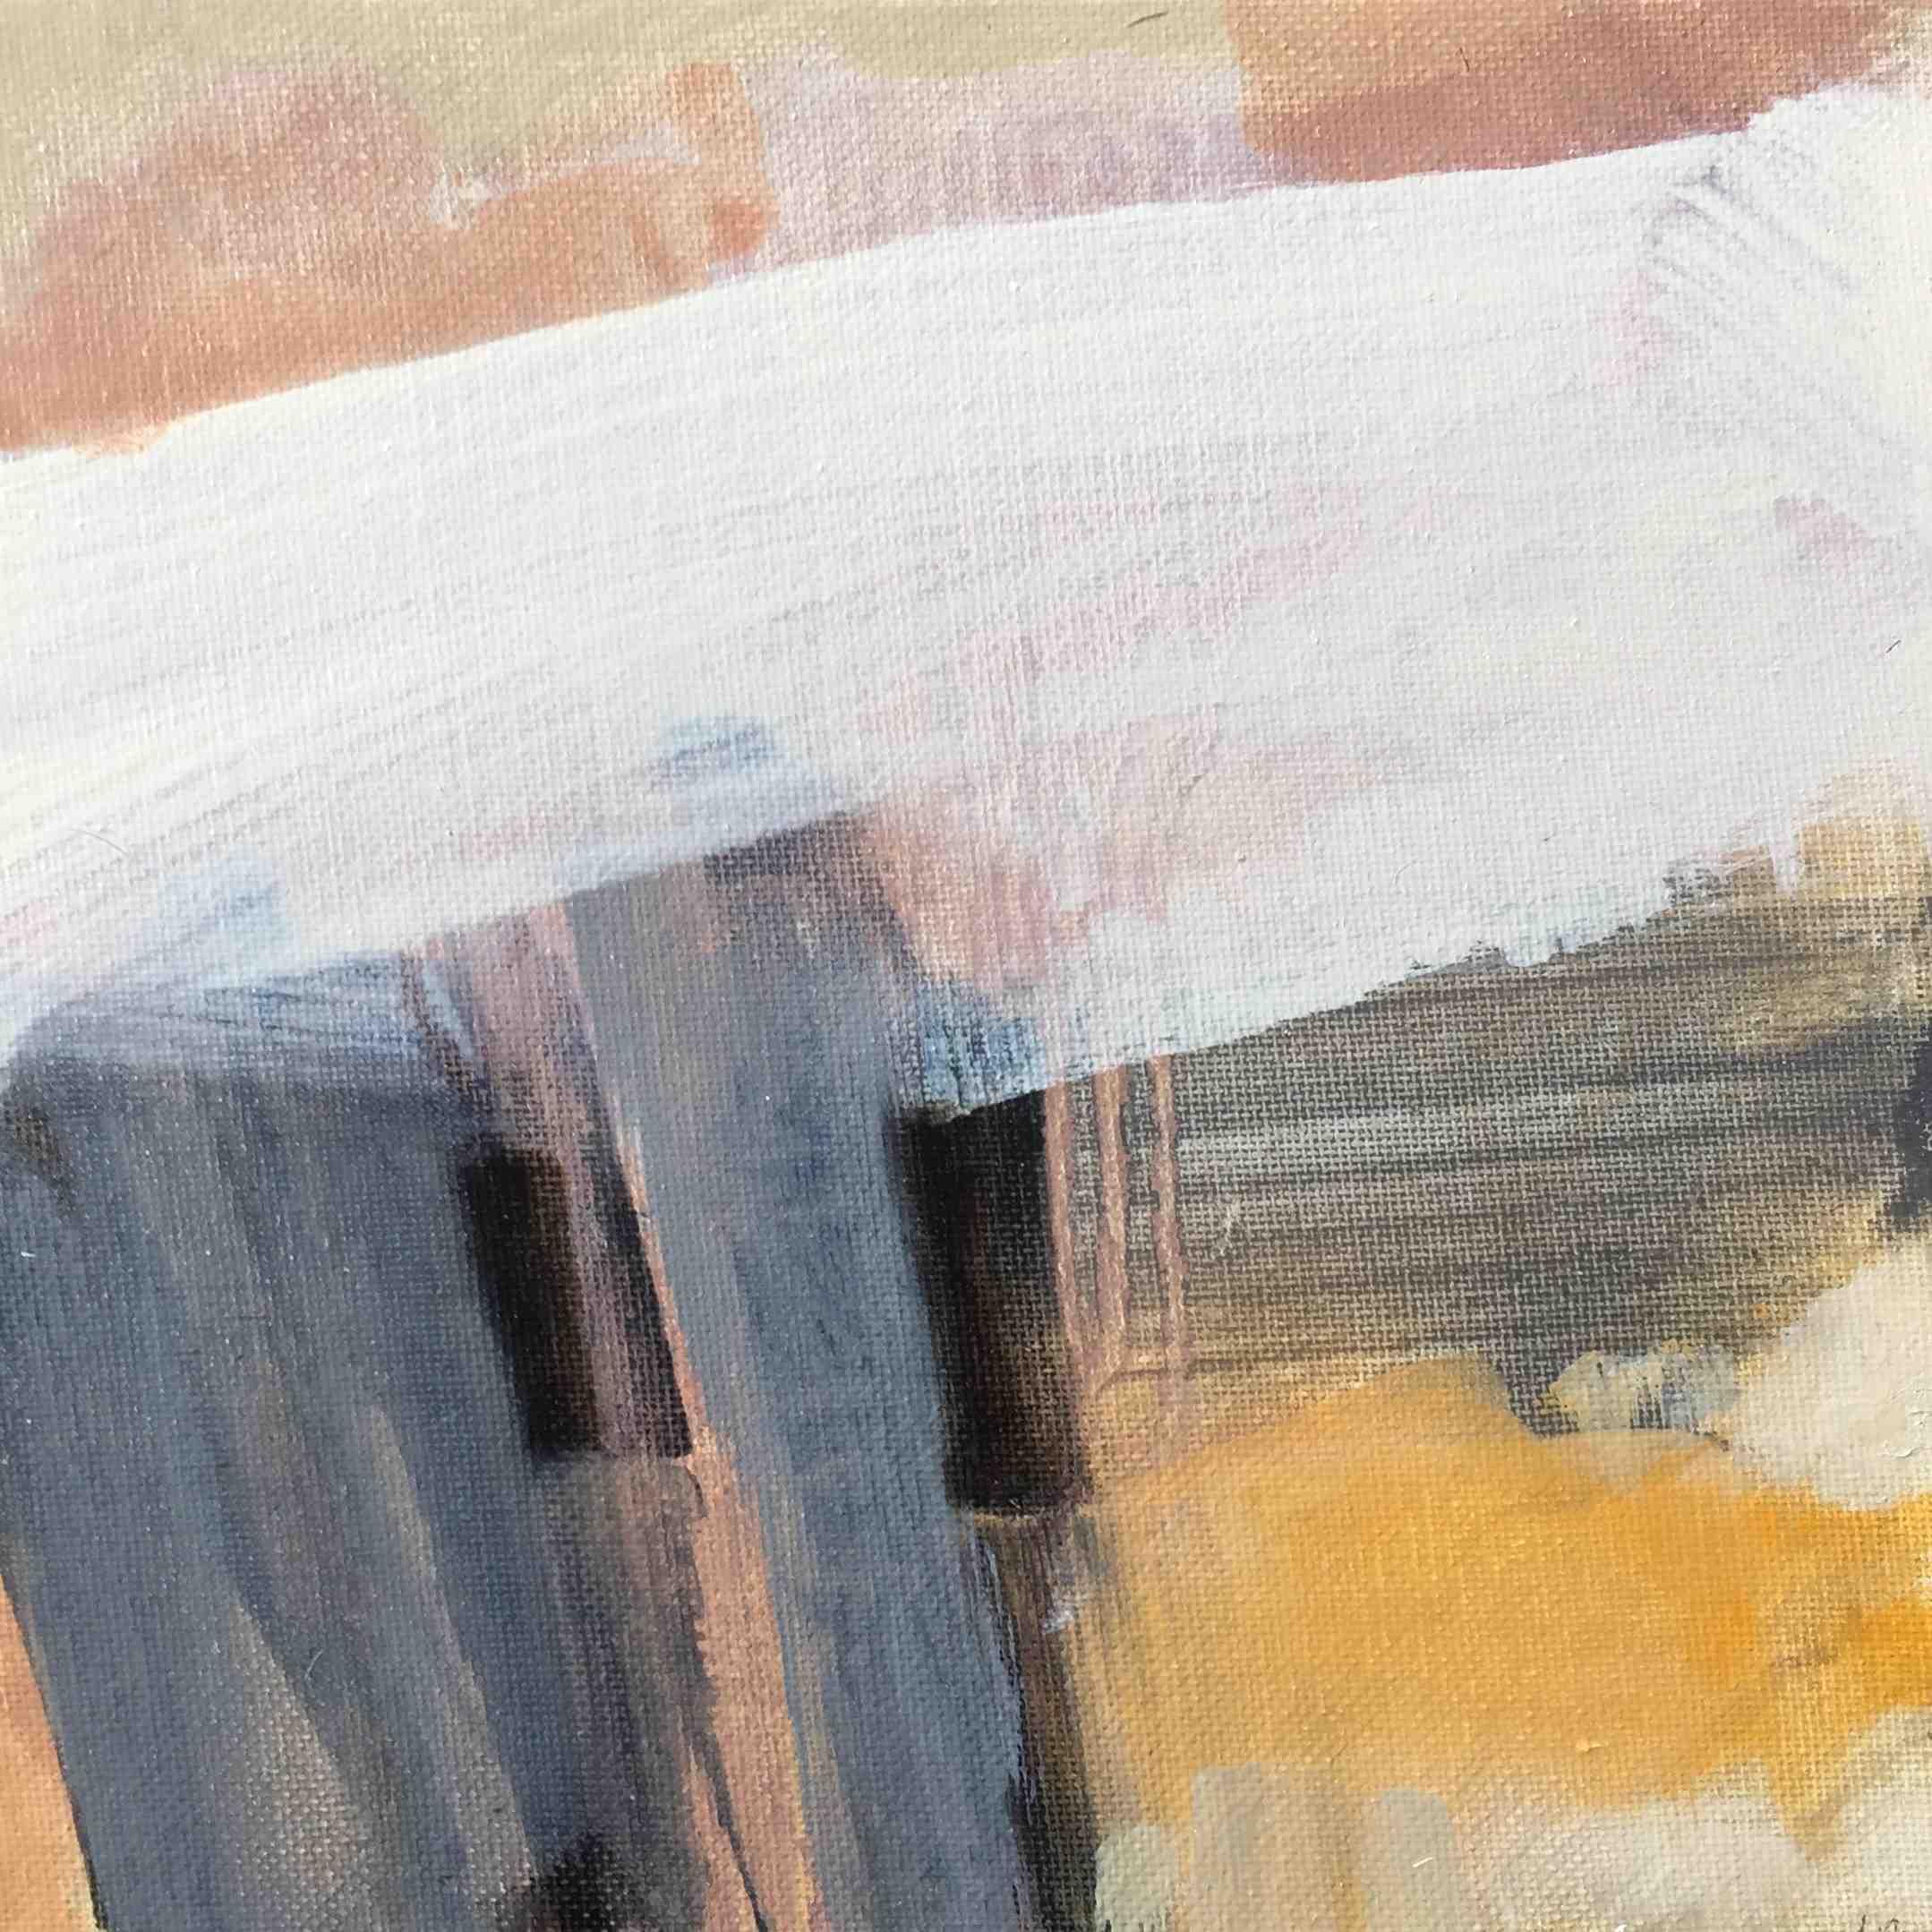 Leah Beggs, High Rise, oil on canvas, 20 x 20 cm